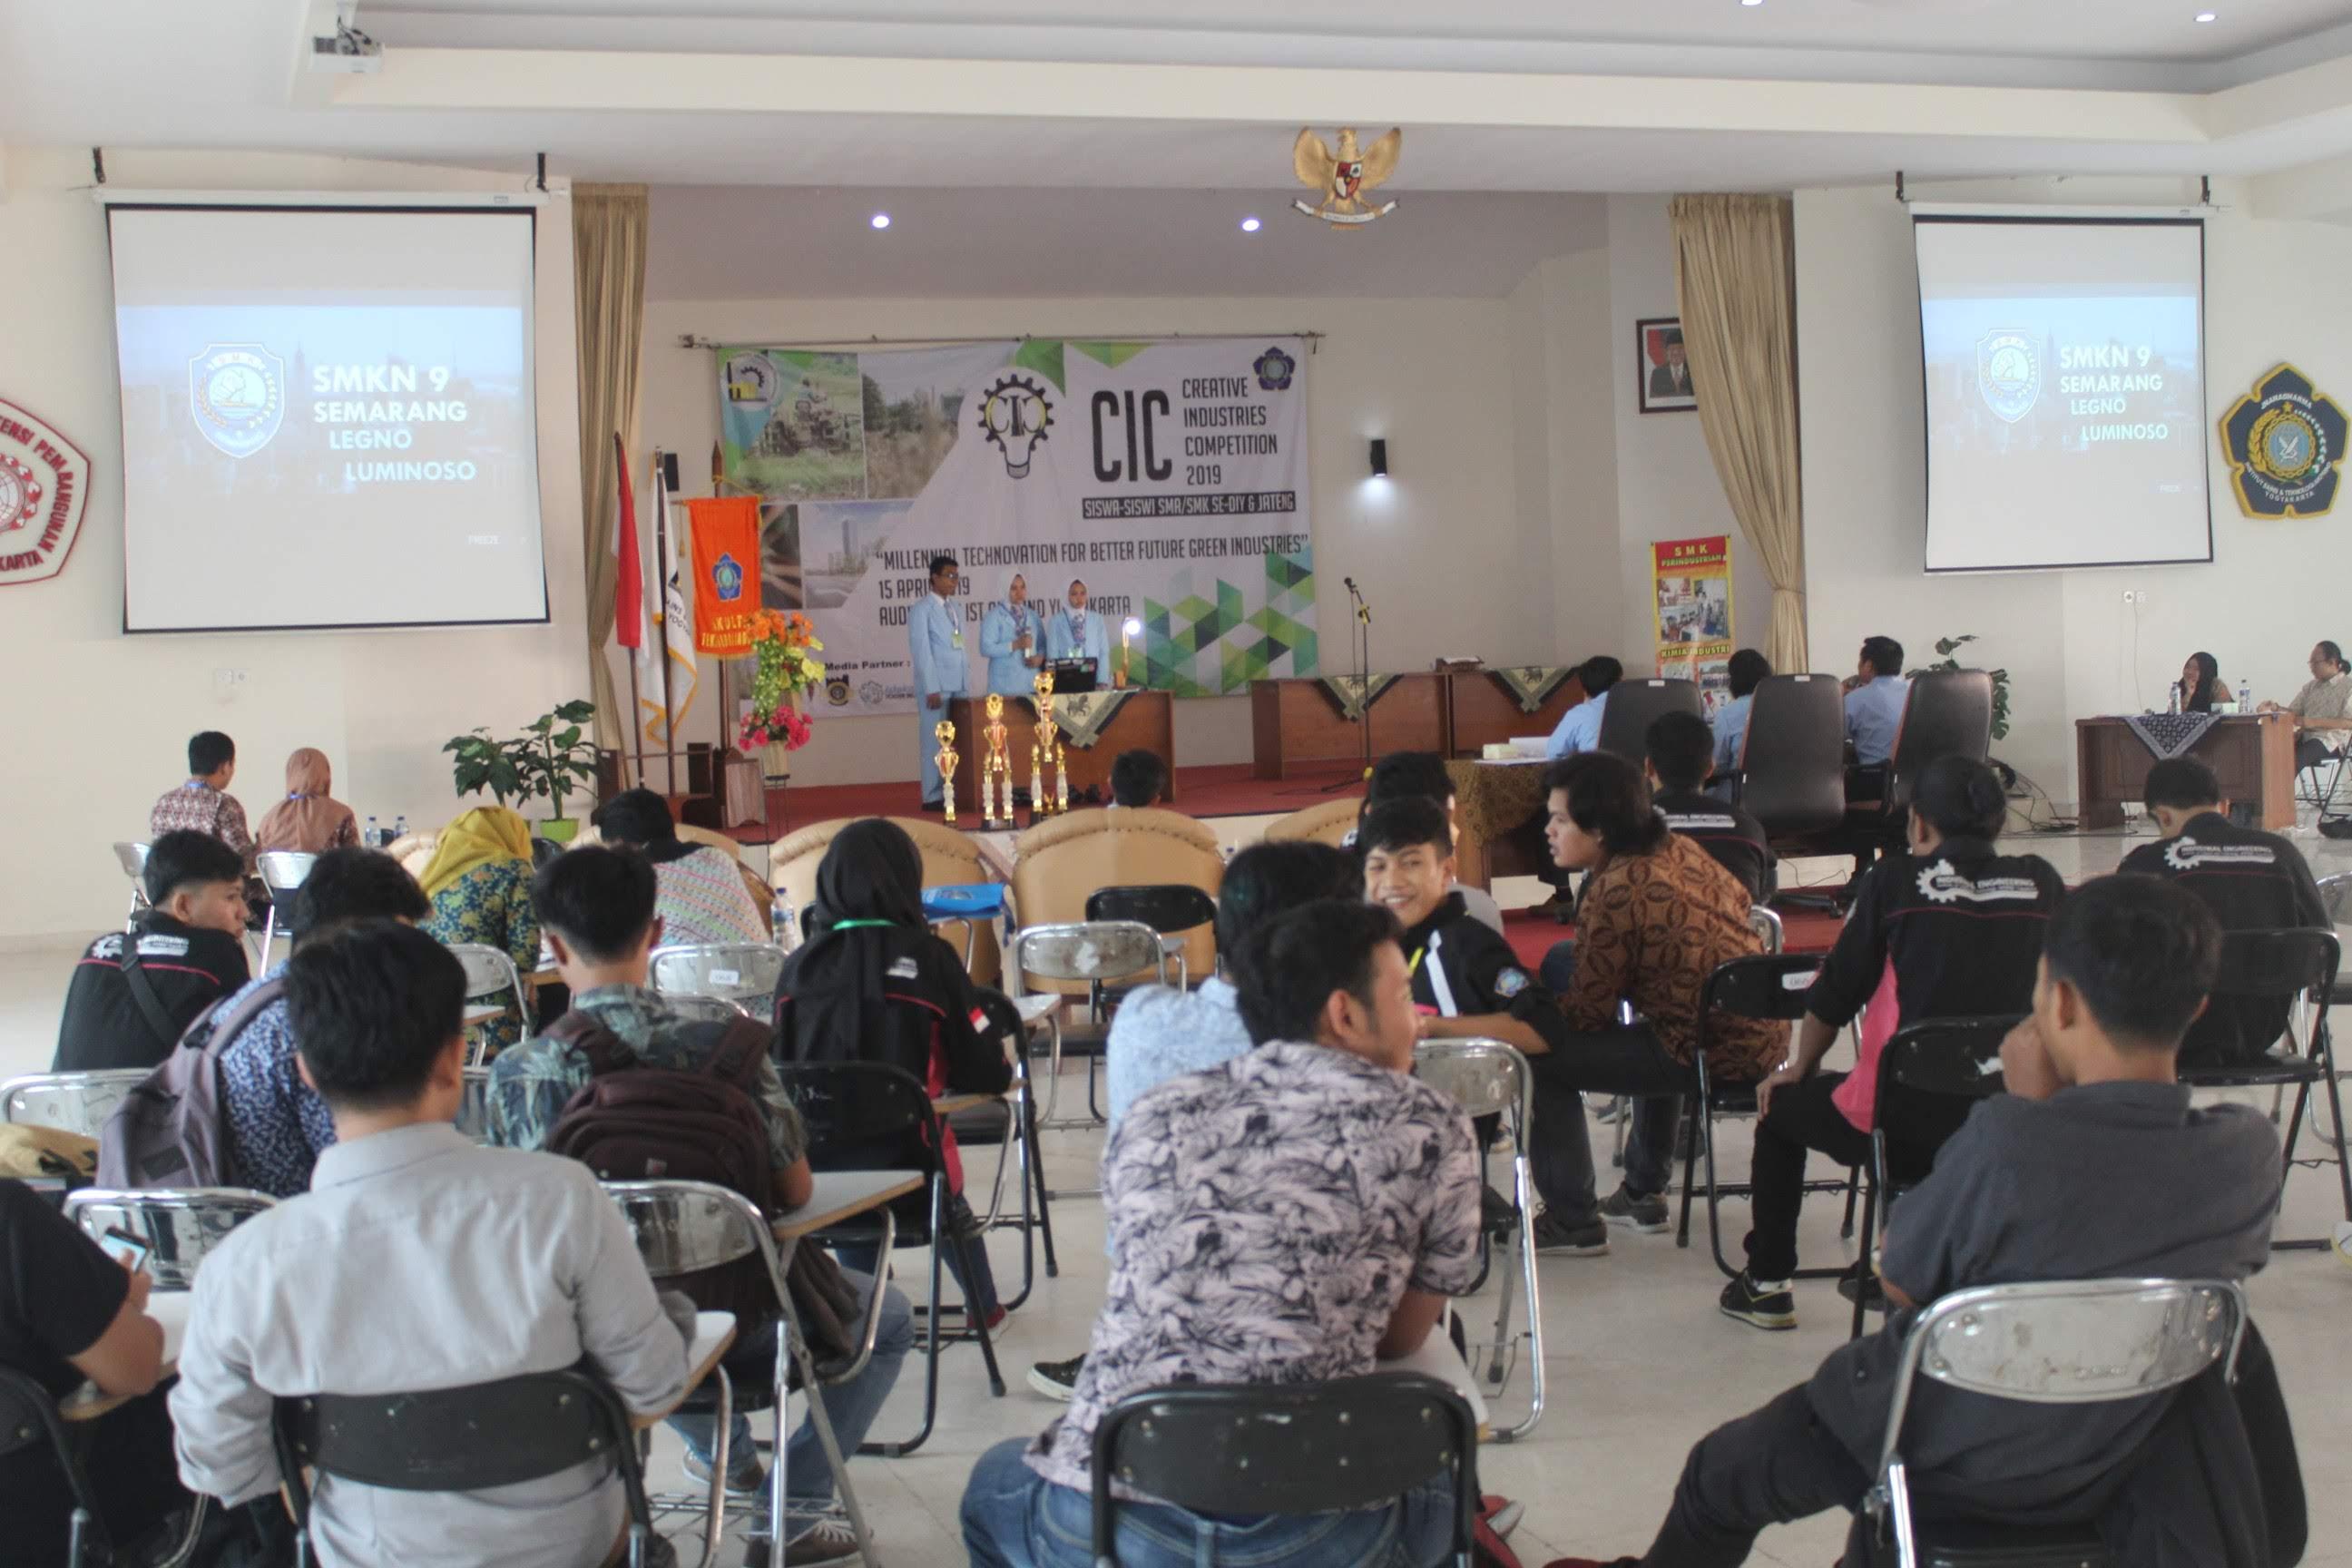 Tingkatkan Inovasi siswa SMA/K Se-DIY & Jateng Melalui Kompetisi Industri Kreatif 2019